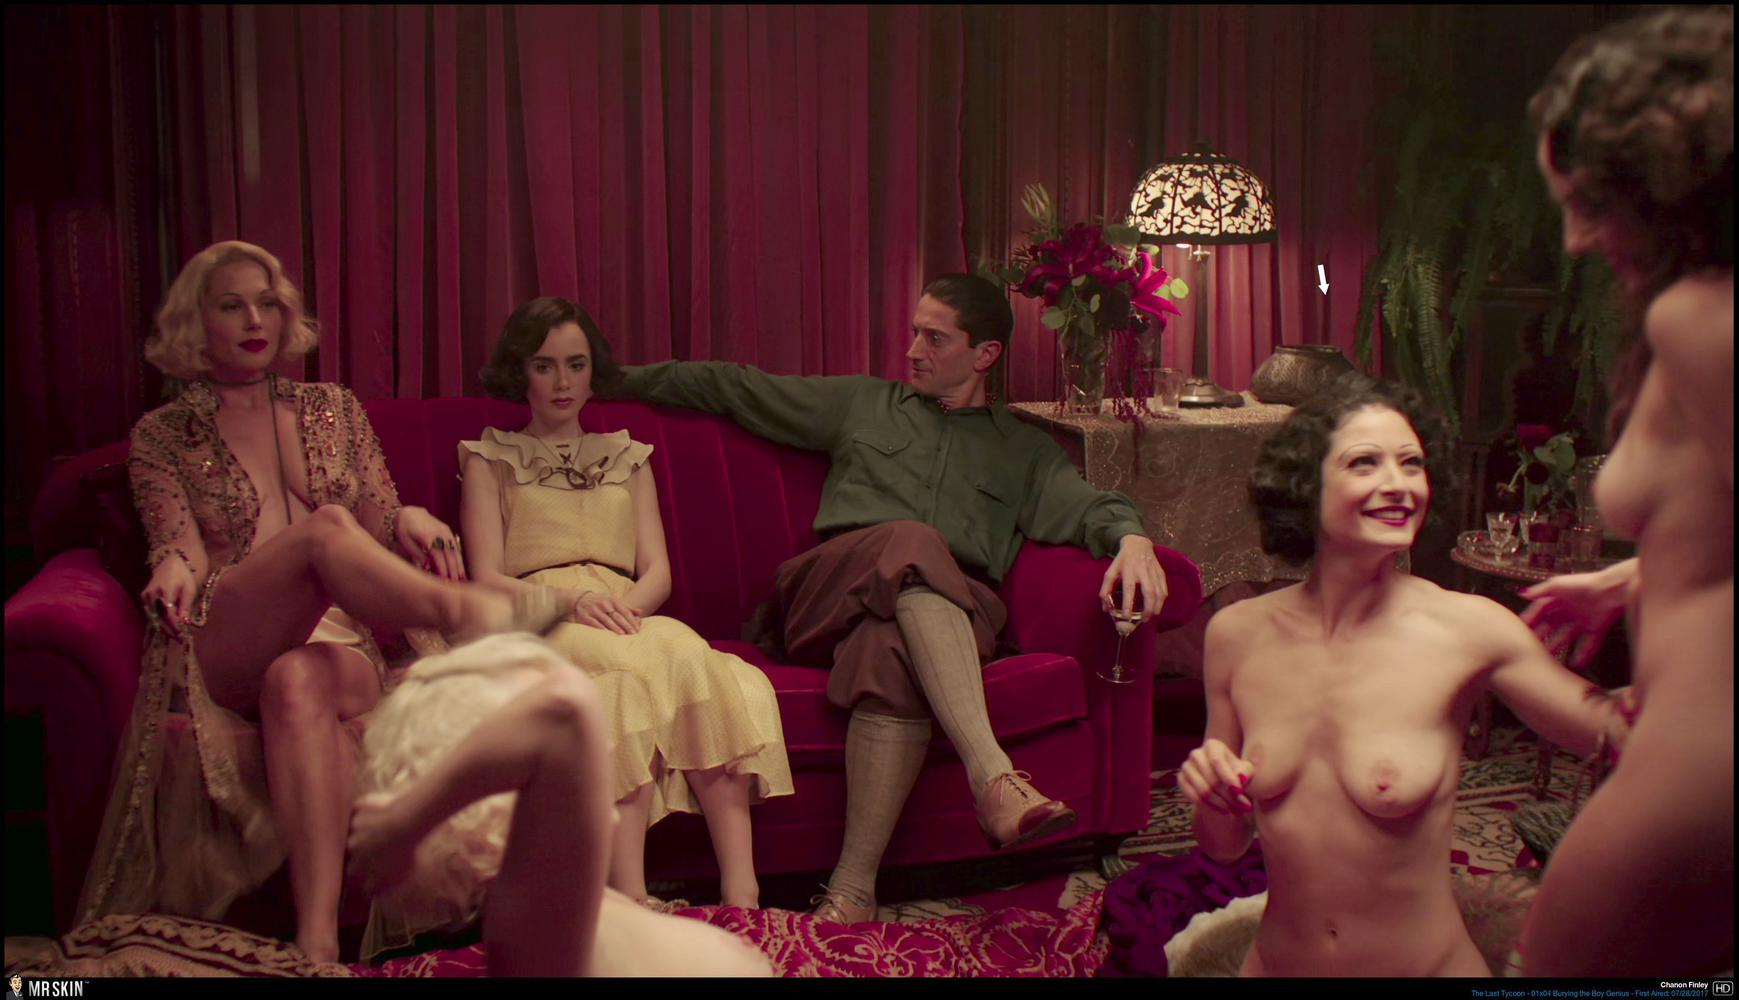 Nudes of girls season 2 shiri appleby lena dunham and co